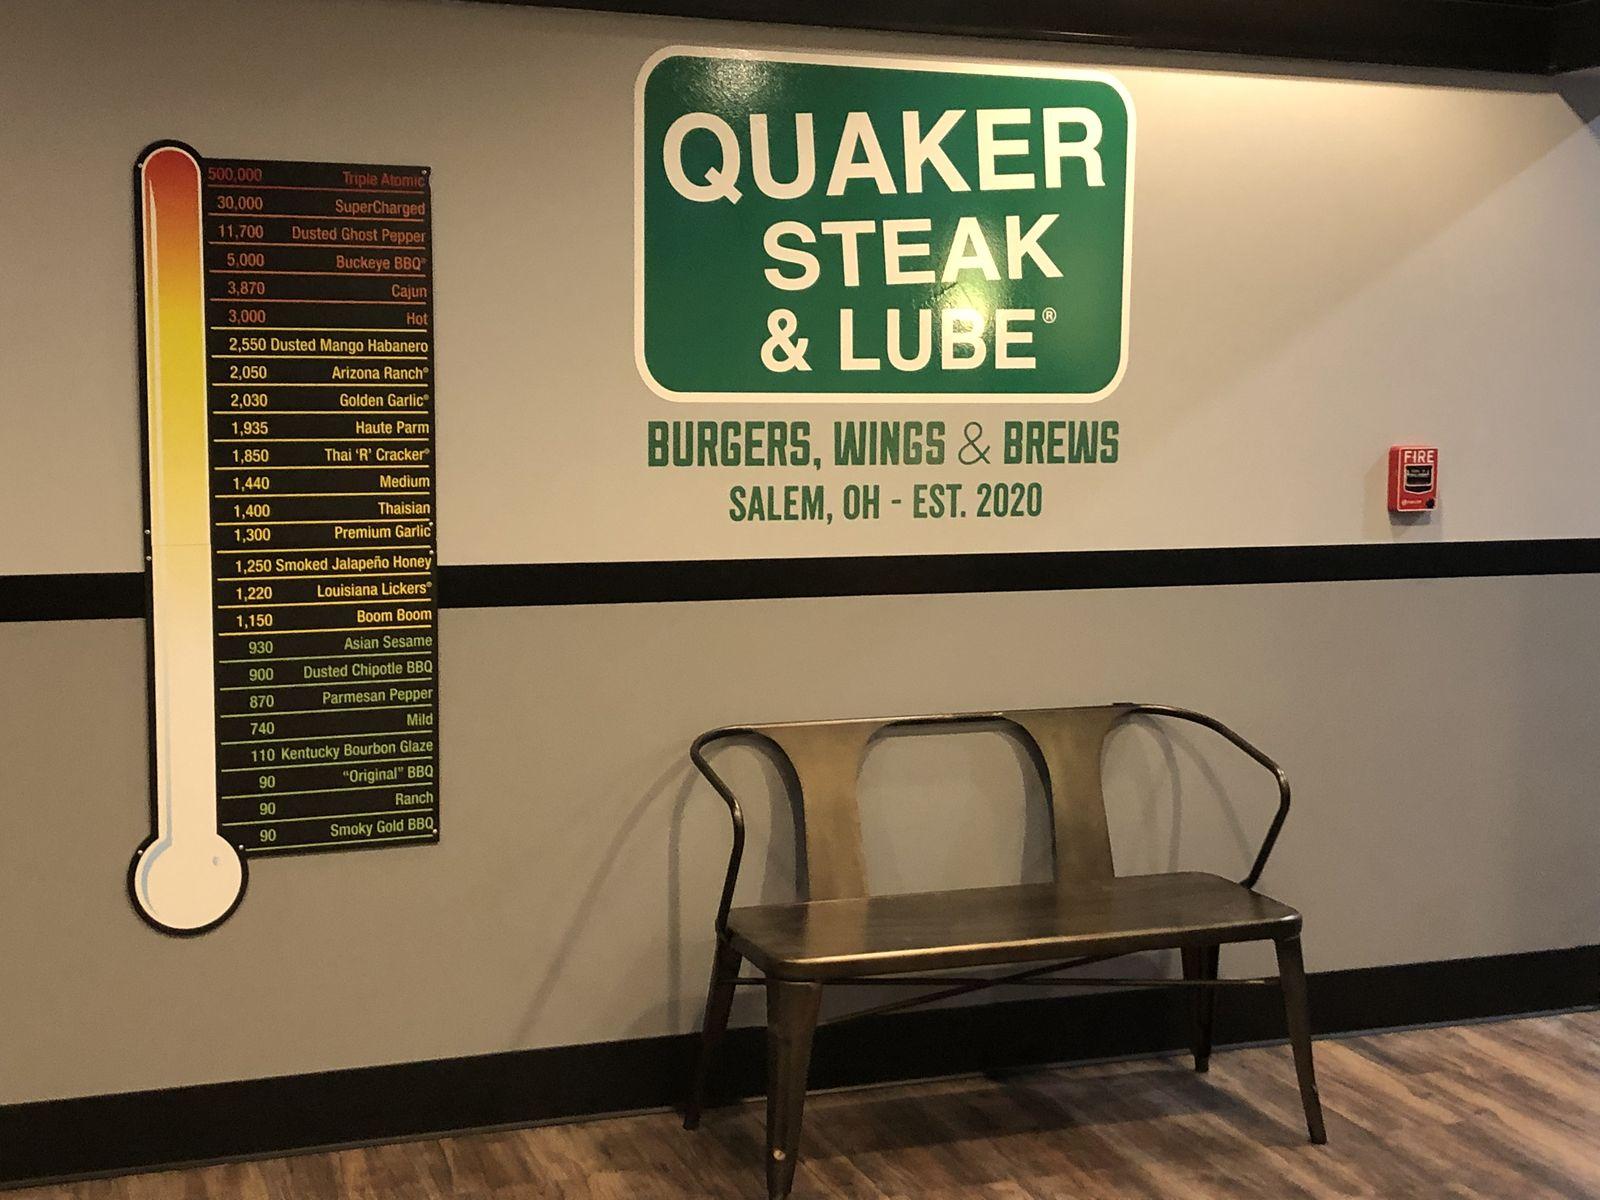 Quaker Steak & Lube Ready to Serve Salem